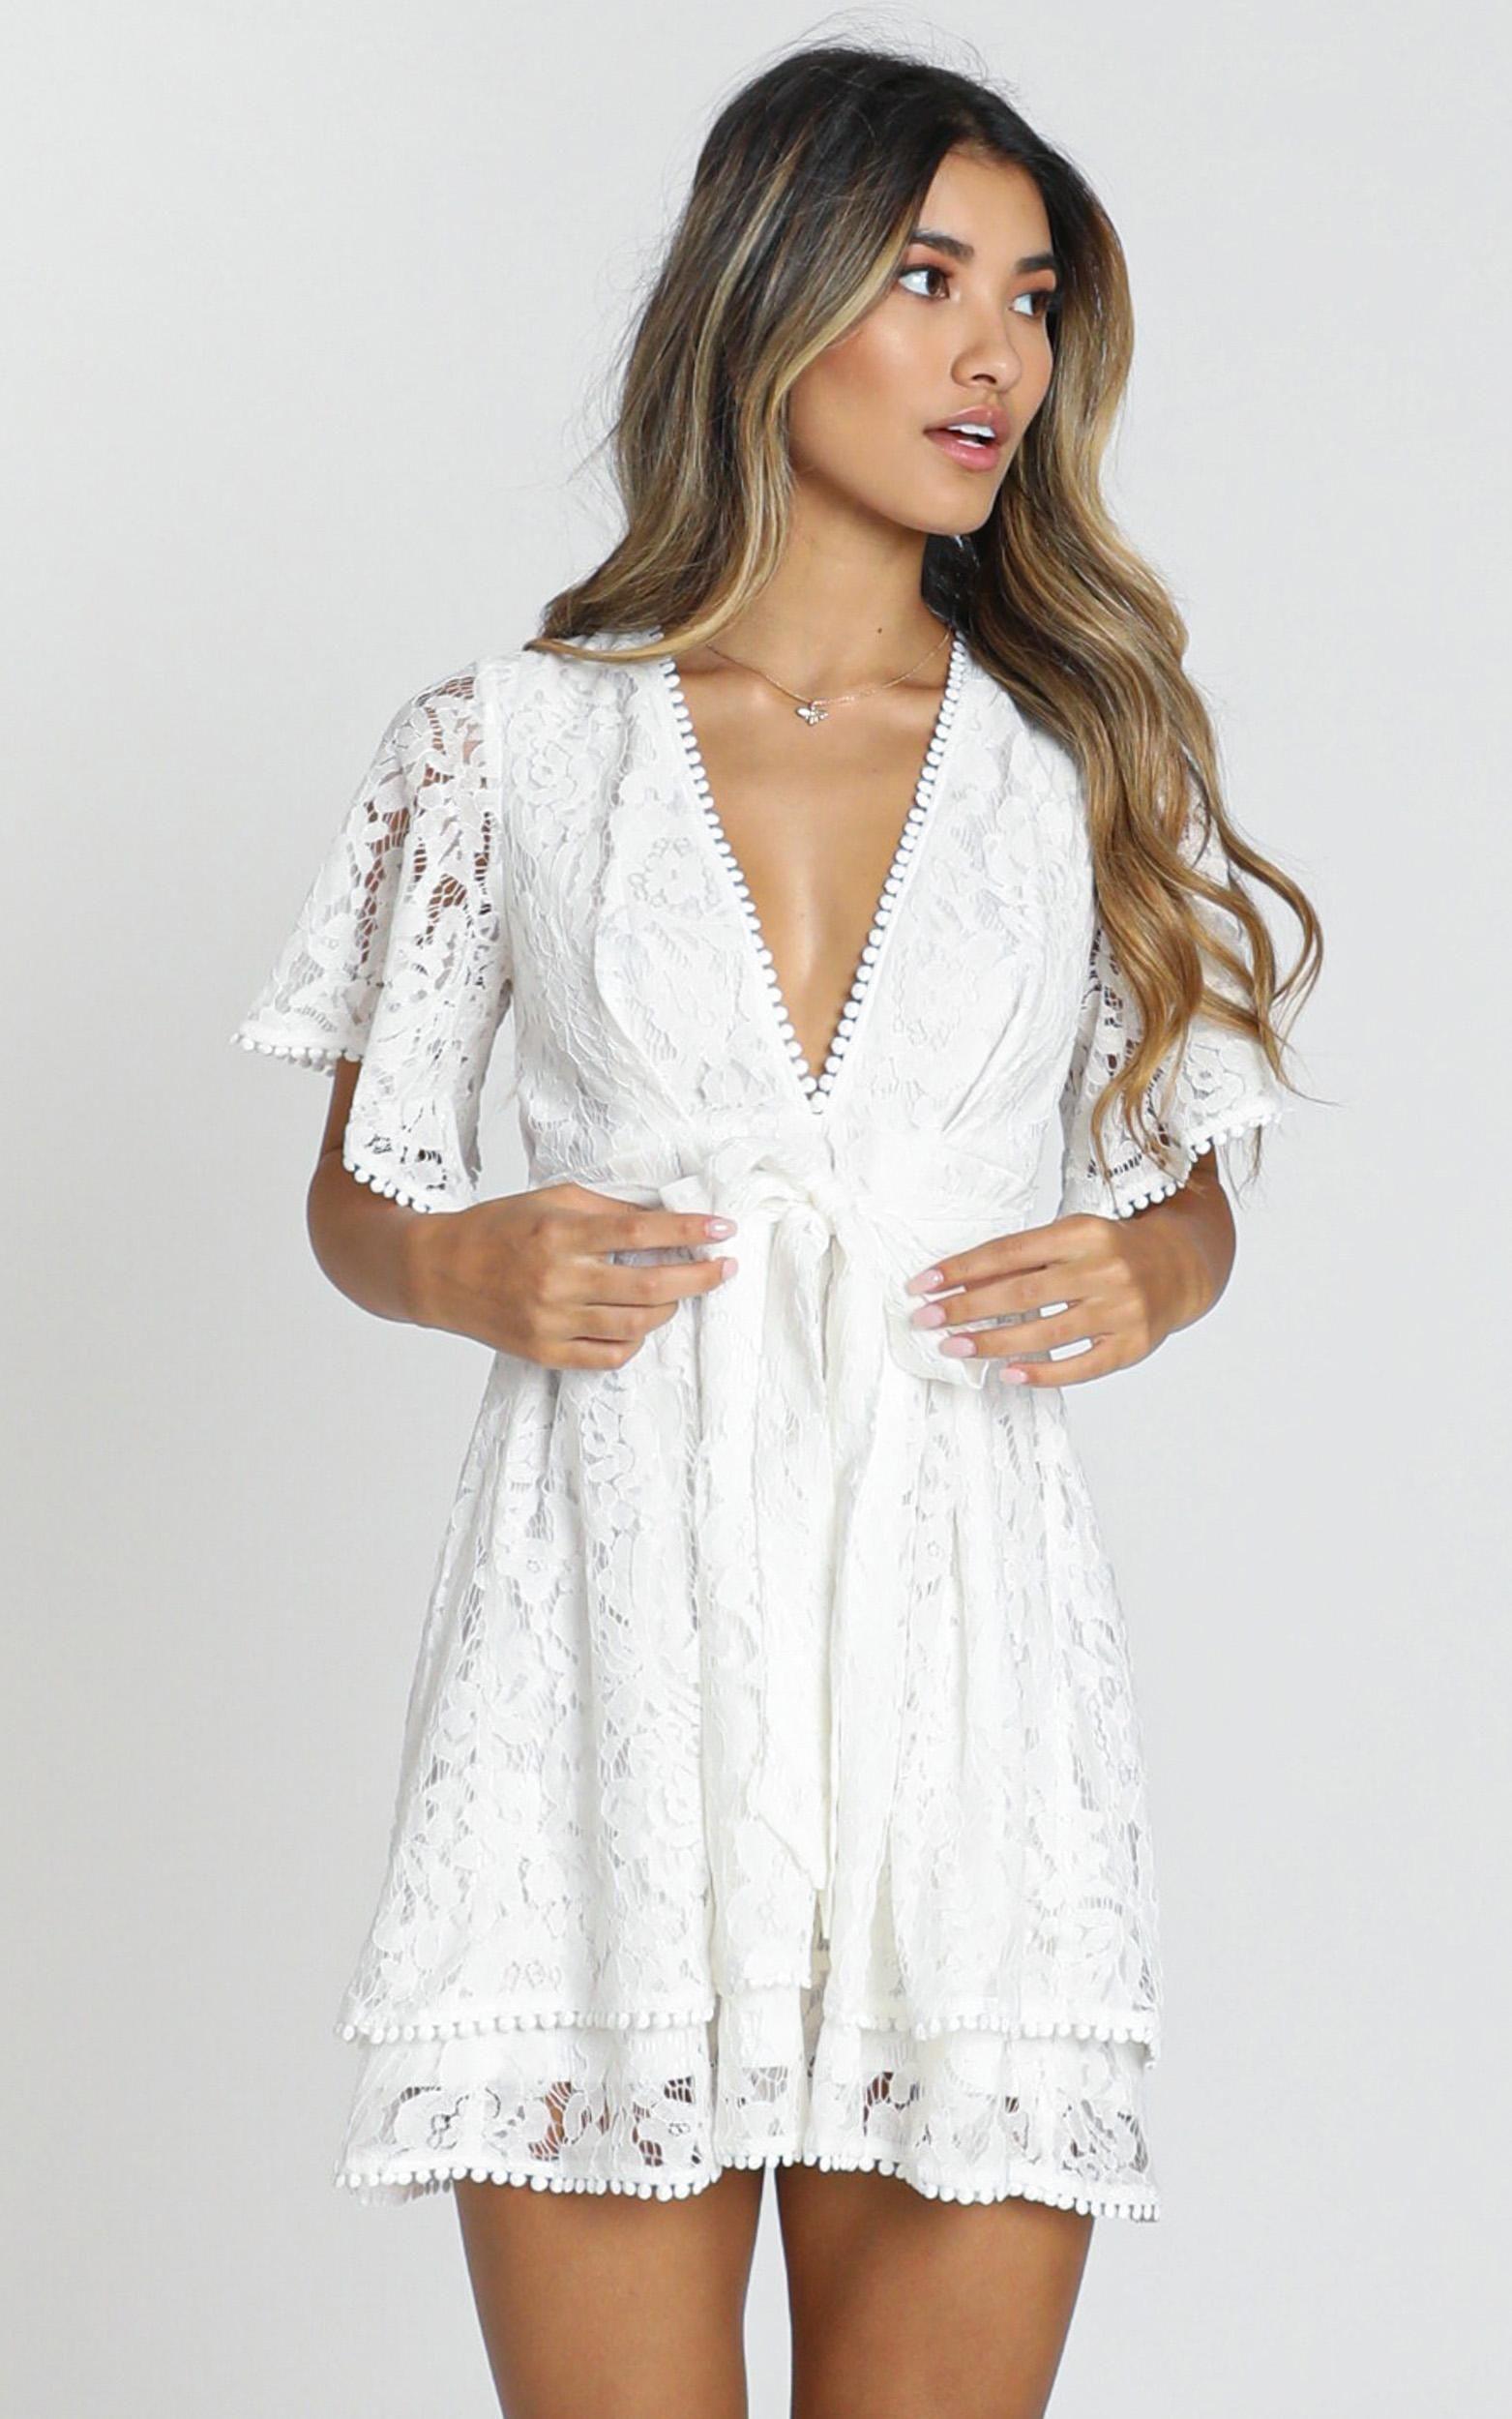 Do You Miss Me Dress In White Lace Showpo White Lace Dress Short White Dresses Graduation Dresses [ 2500 x 1563 Pixel ]